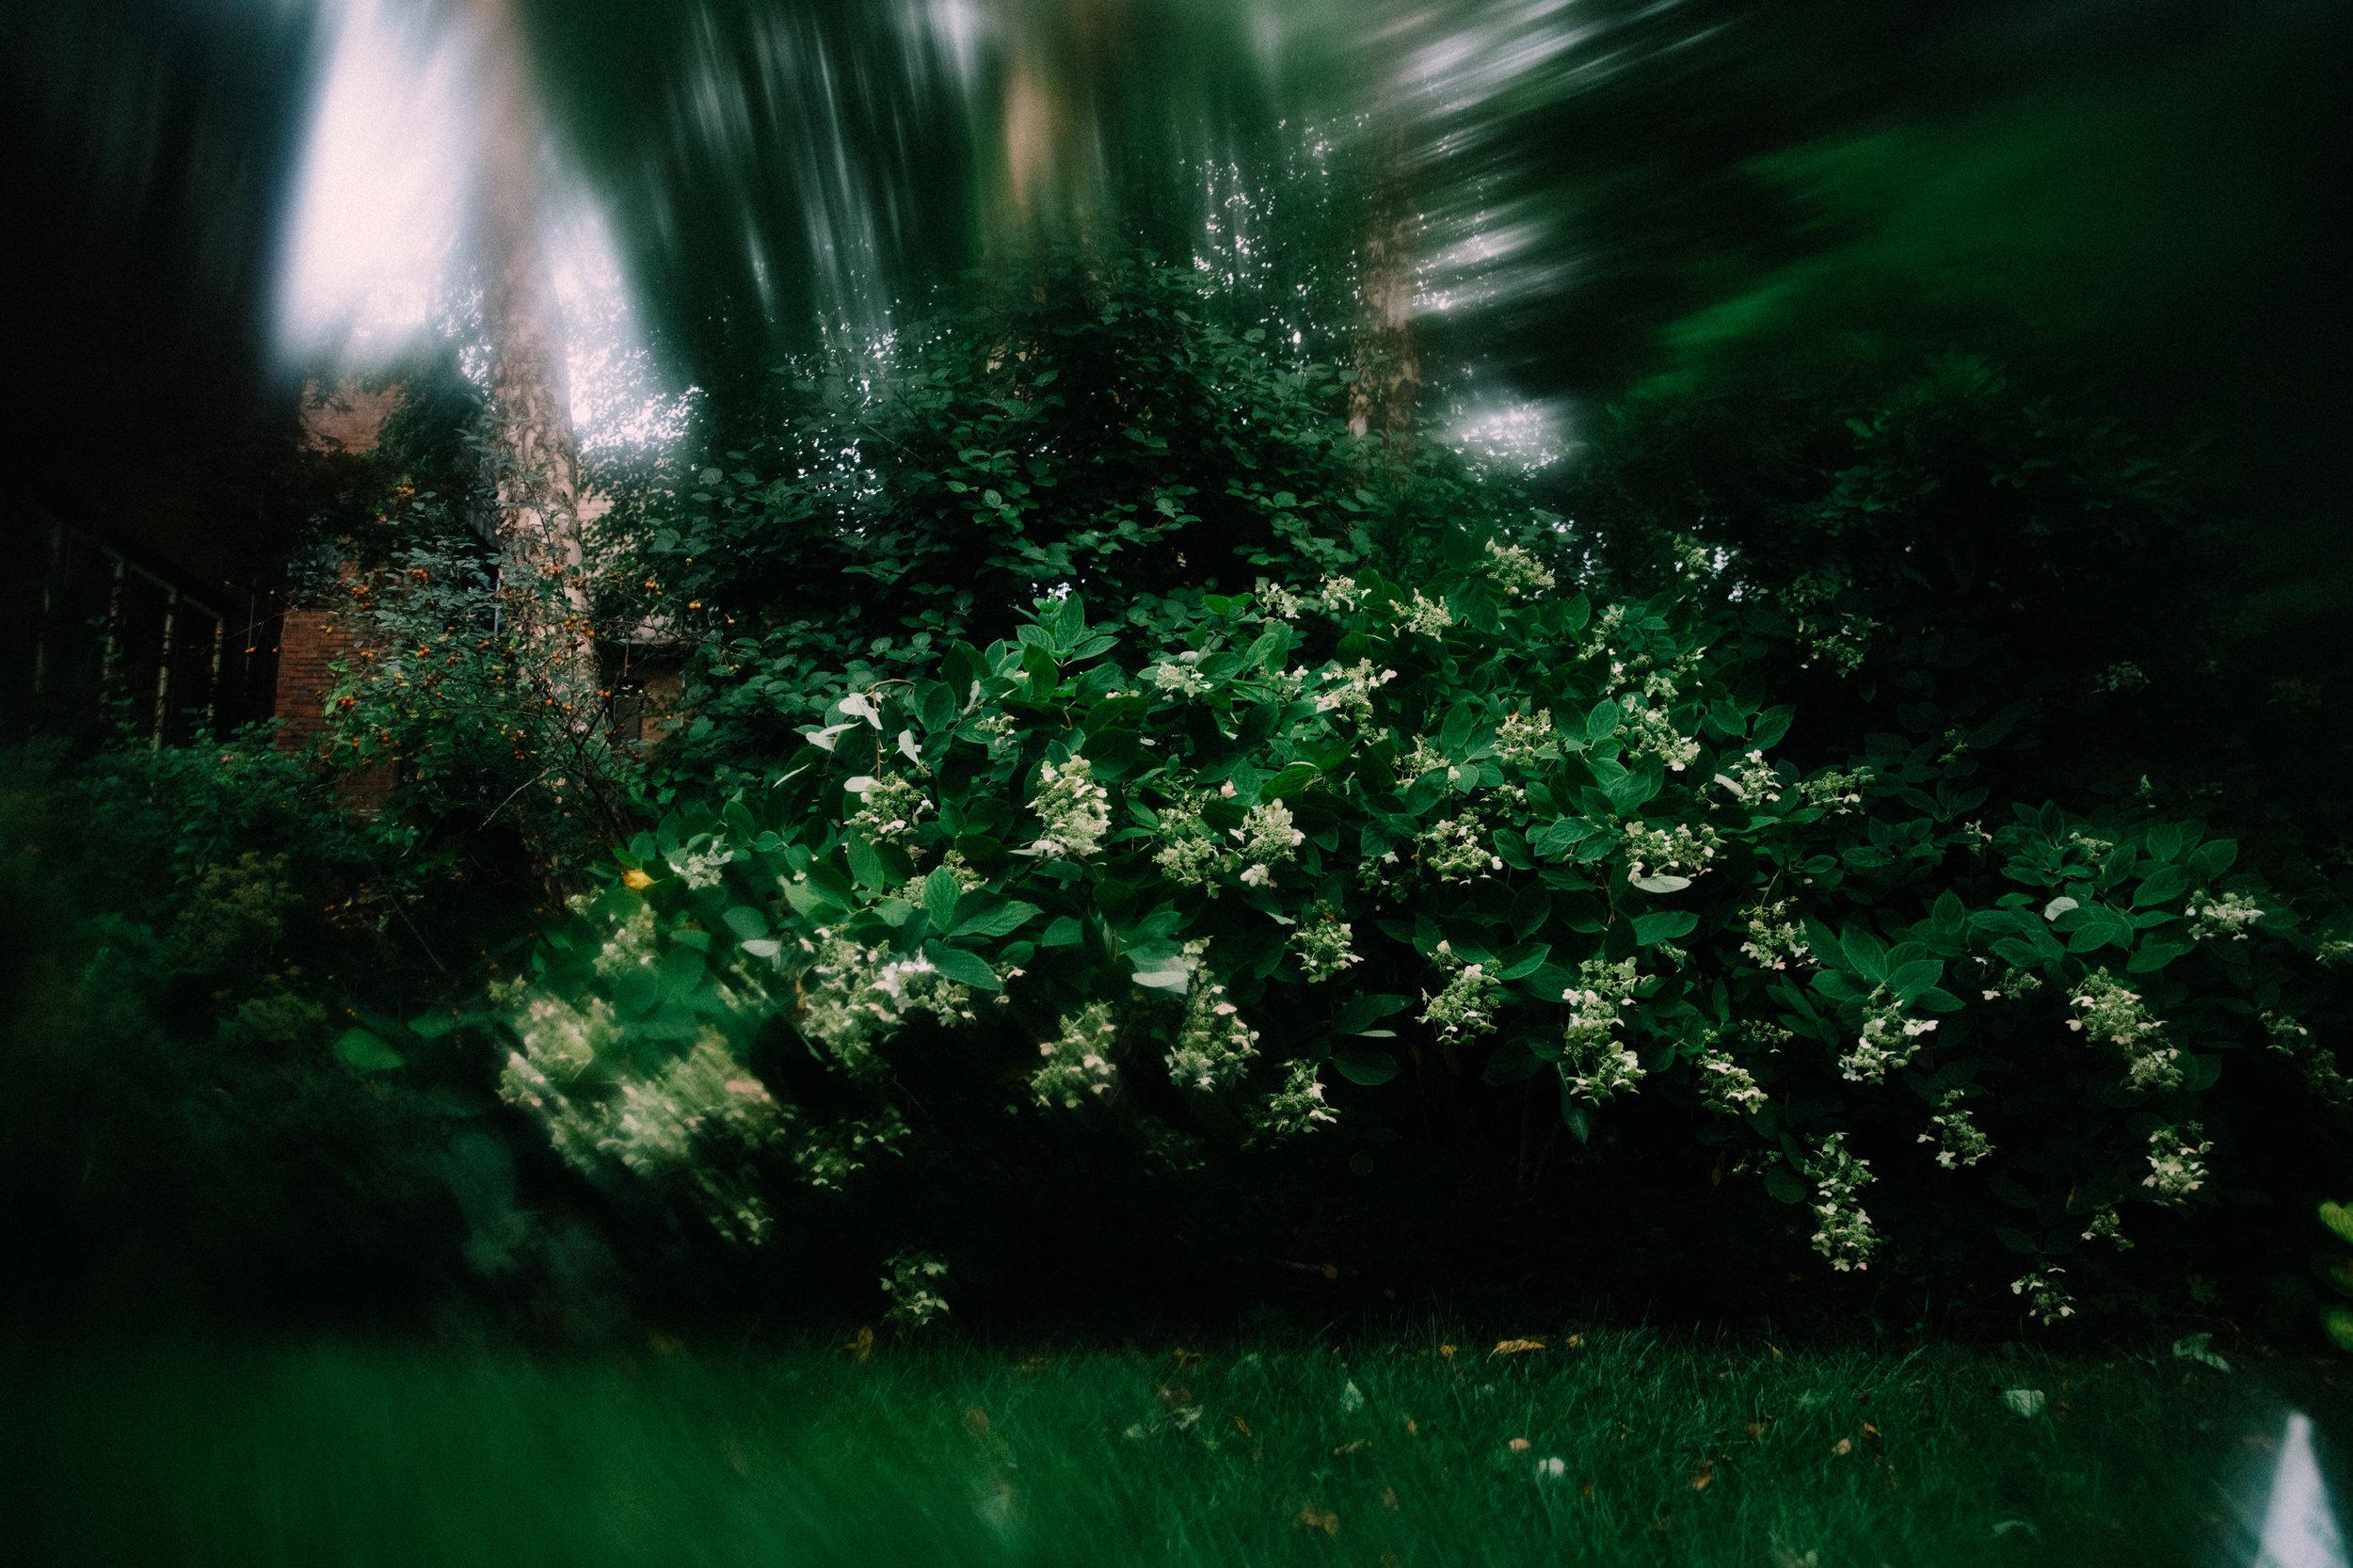 Vaseline photography example